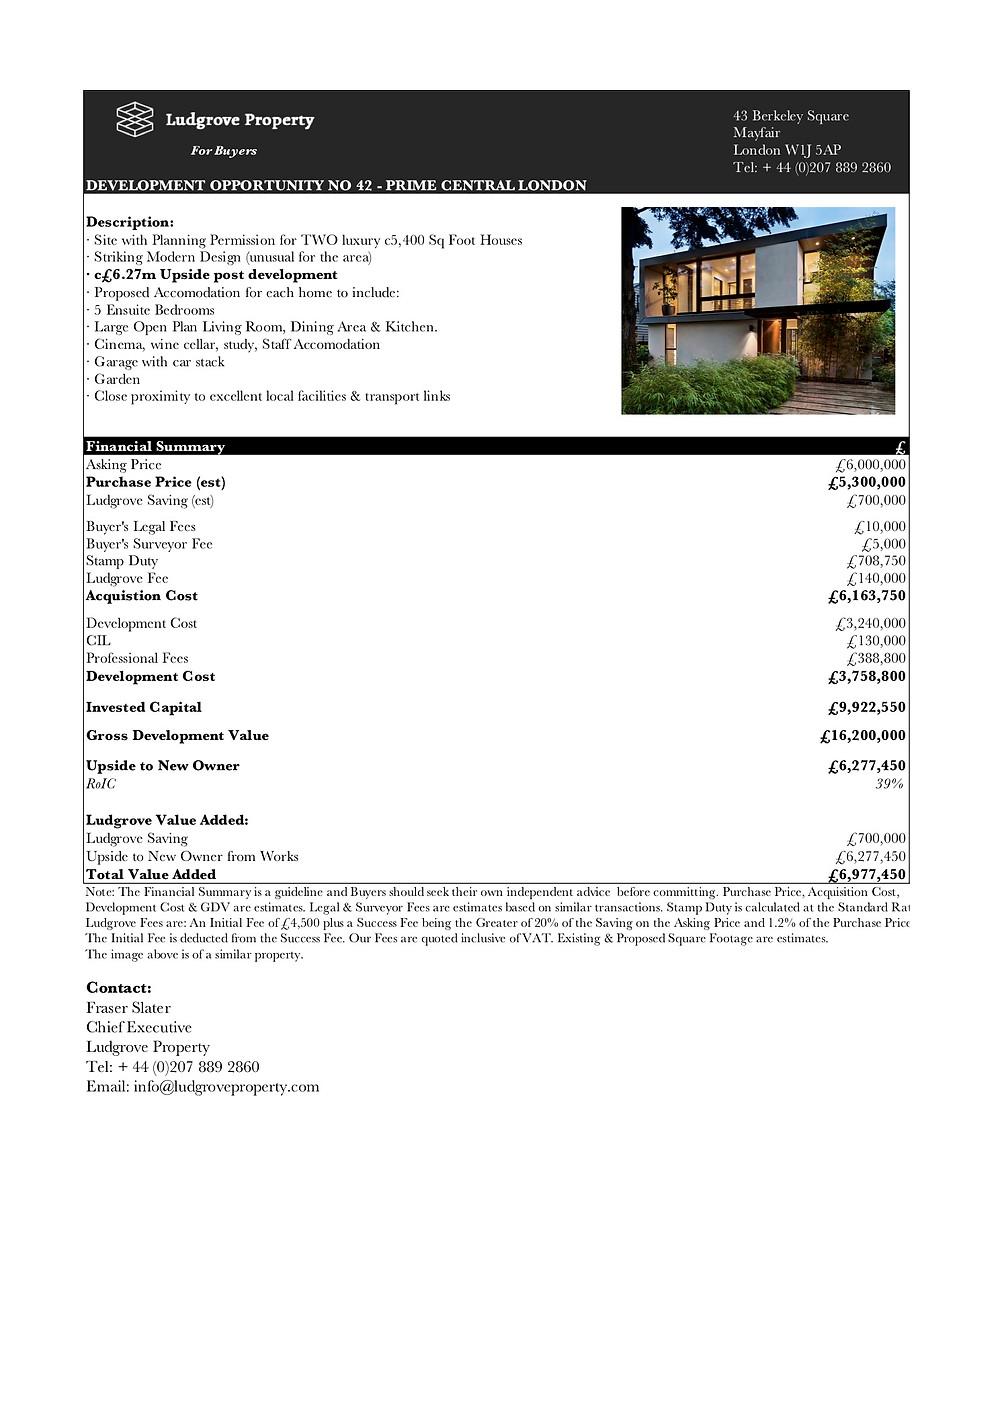 London Property Finder Ludgrove Development Opportunity